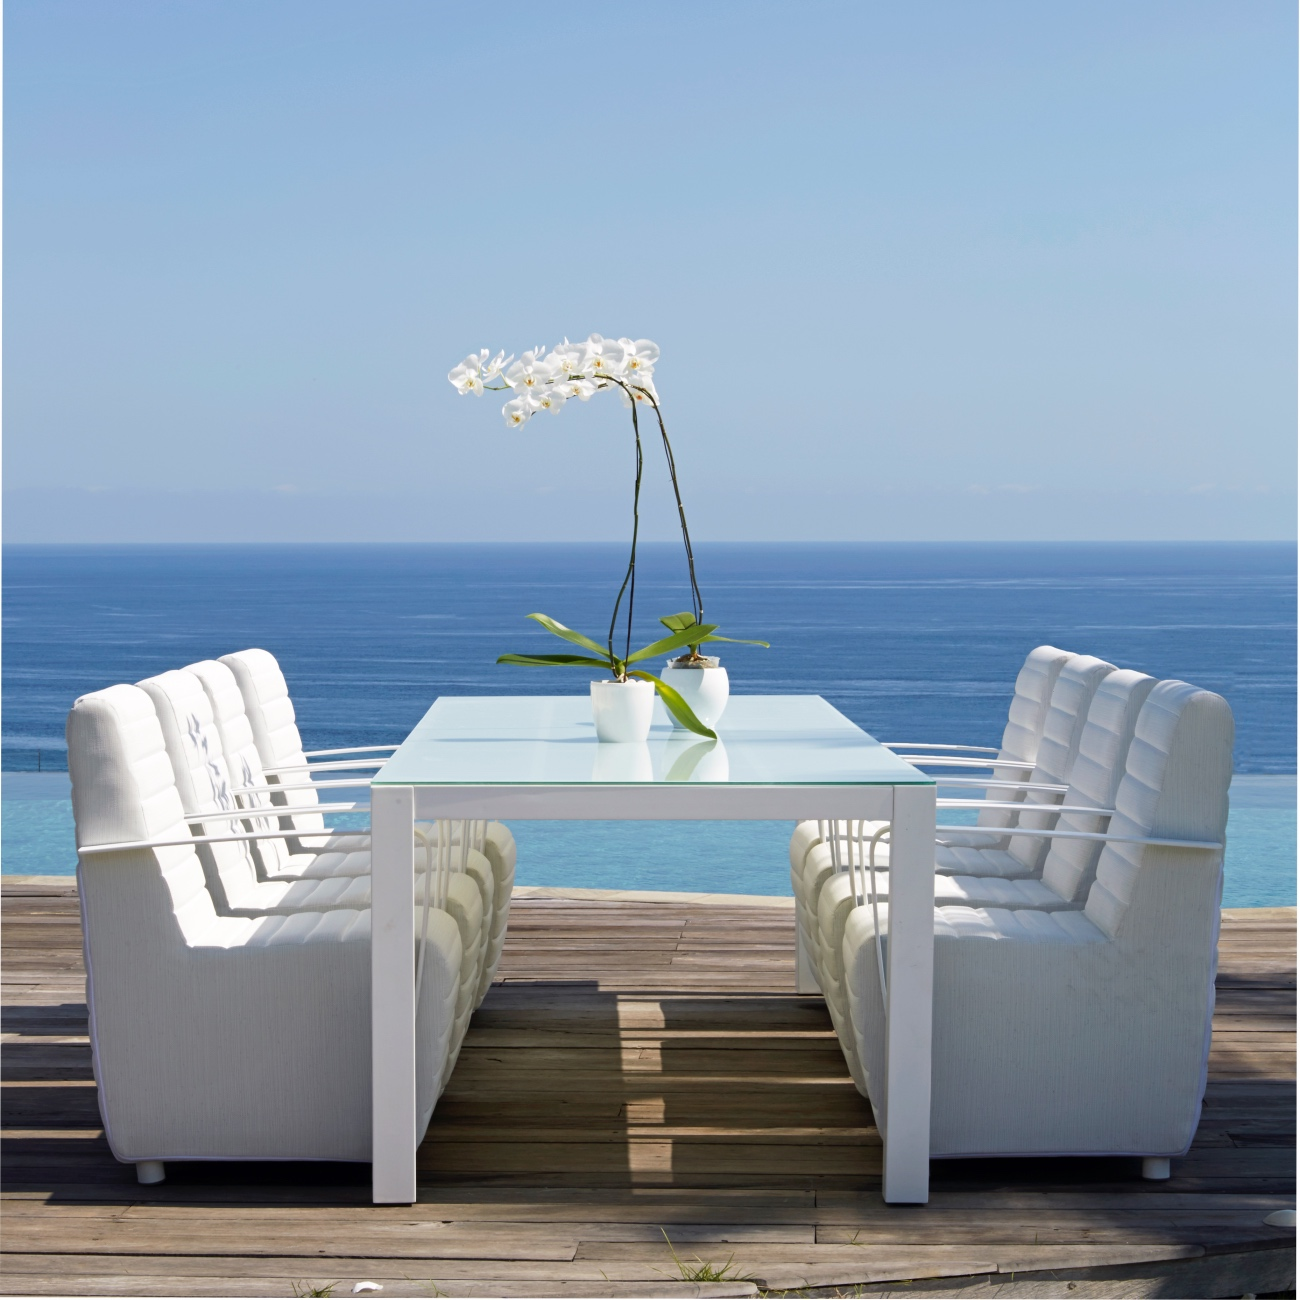 Groovy Skyline Axis Dining Table Seats 8 Evergreenethics Interior Chair Design Evergreenethicsorg